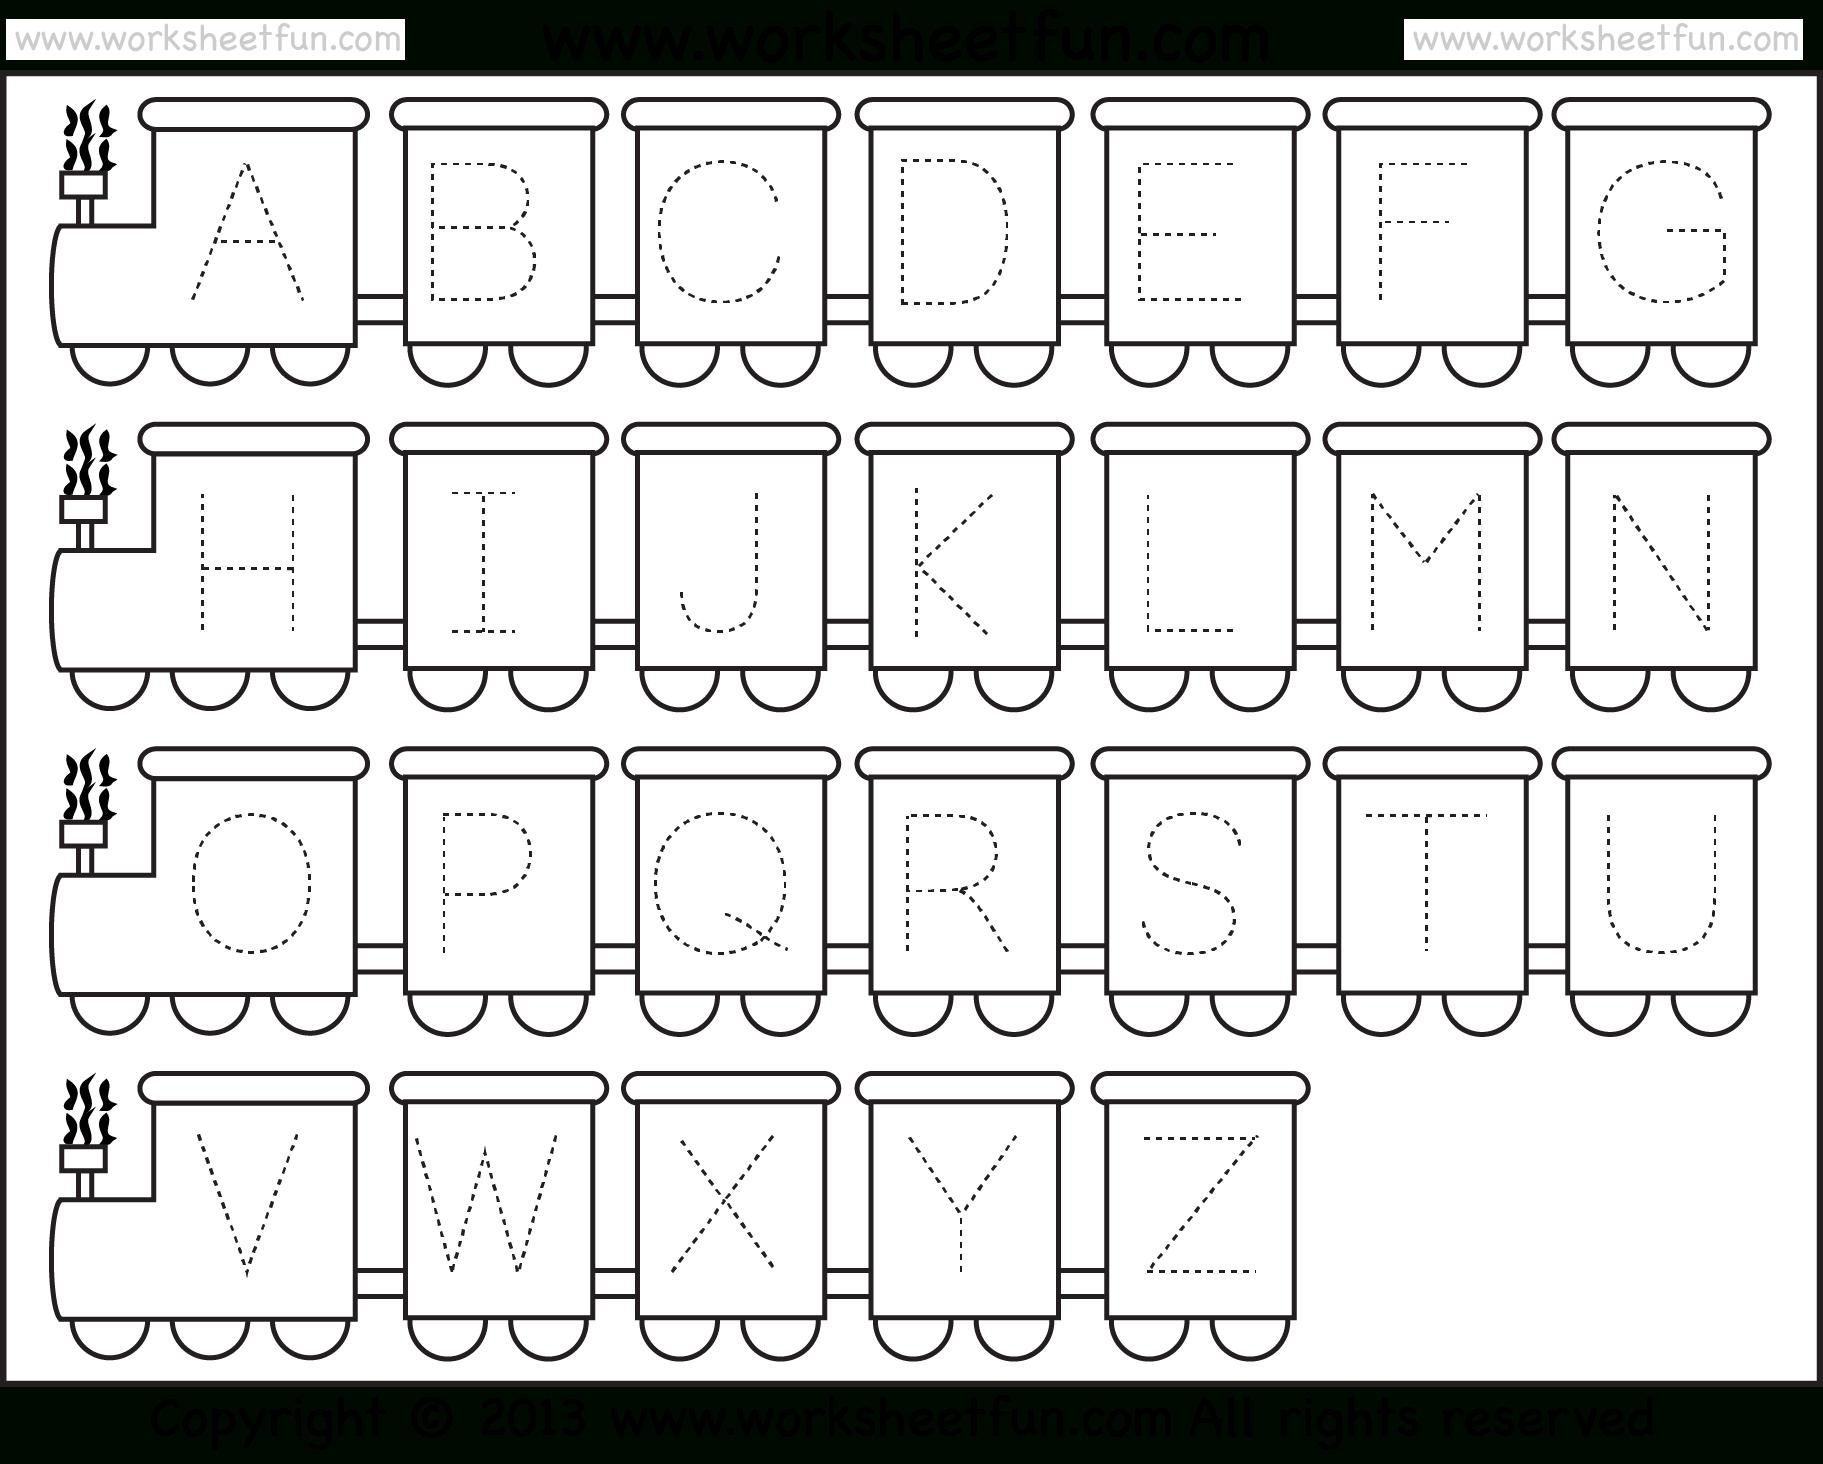 Letter Tracing Worksheet – Train Theme / Free Printable regarding Letter I Worksheets For Kindergarten Free